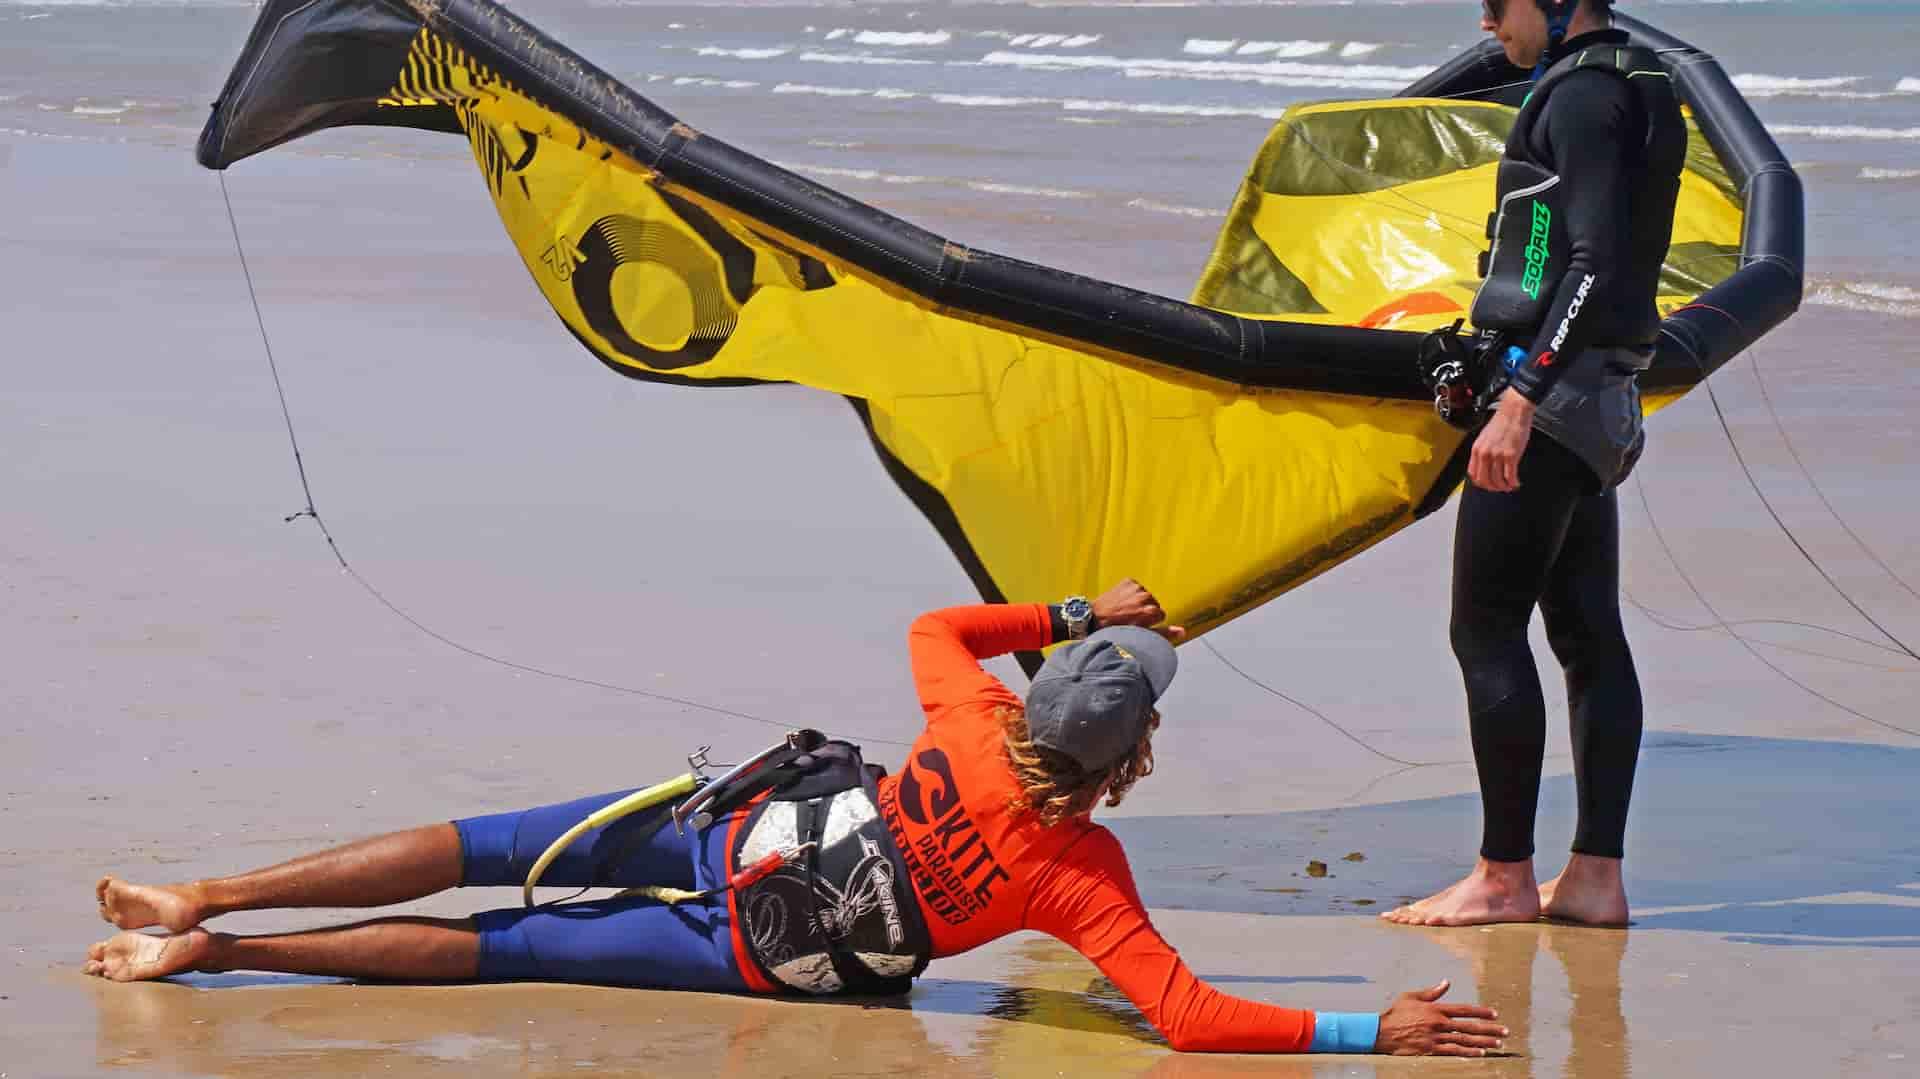 Kitesurf nage tractée